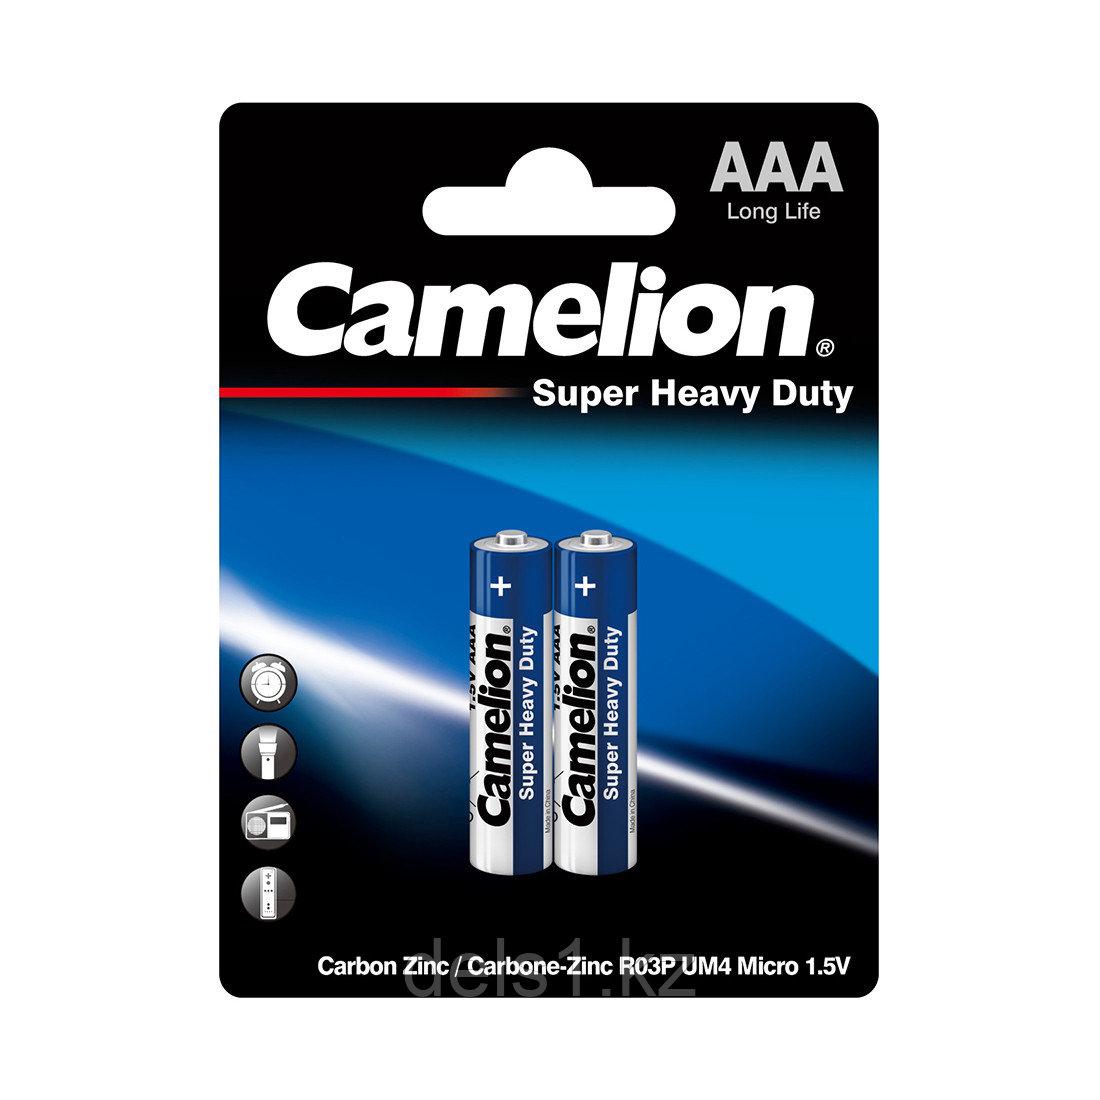 Батарейка, CAMELION, R03P-BP2B, Super Heavy Duty, AAA, 1.5V, 550mAh, 2 шт. в блистере